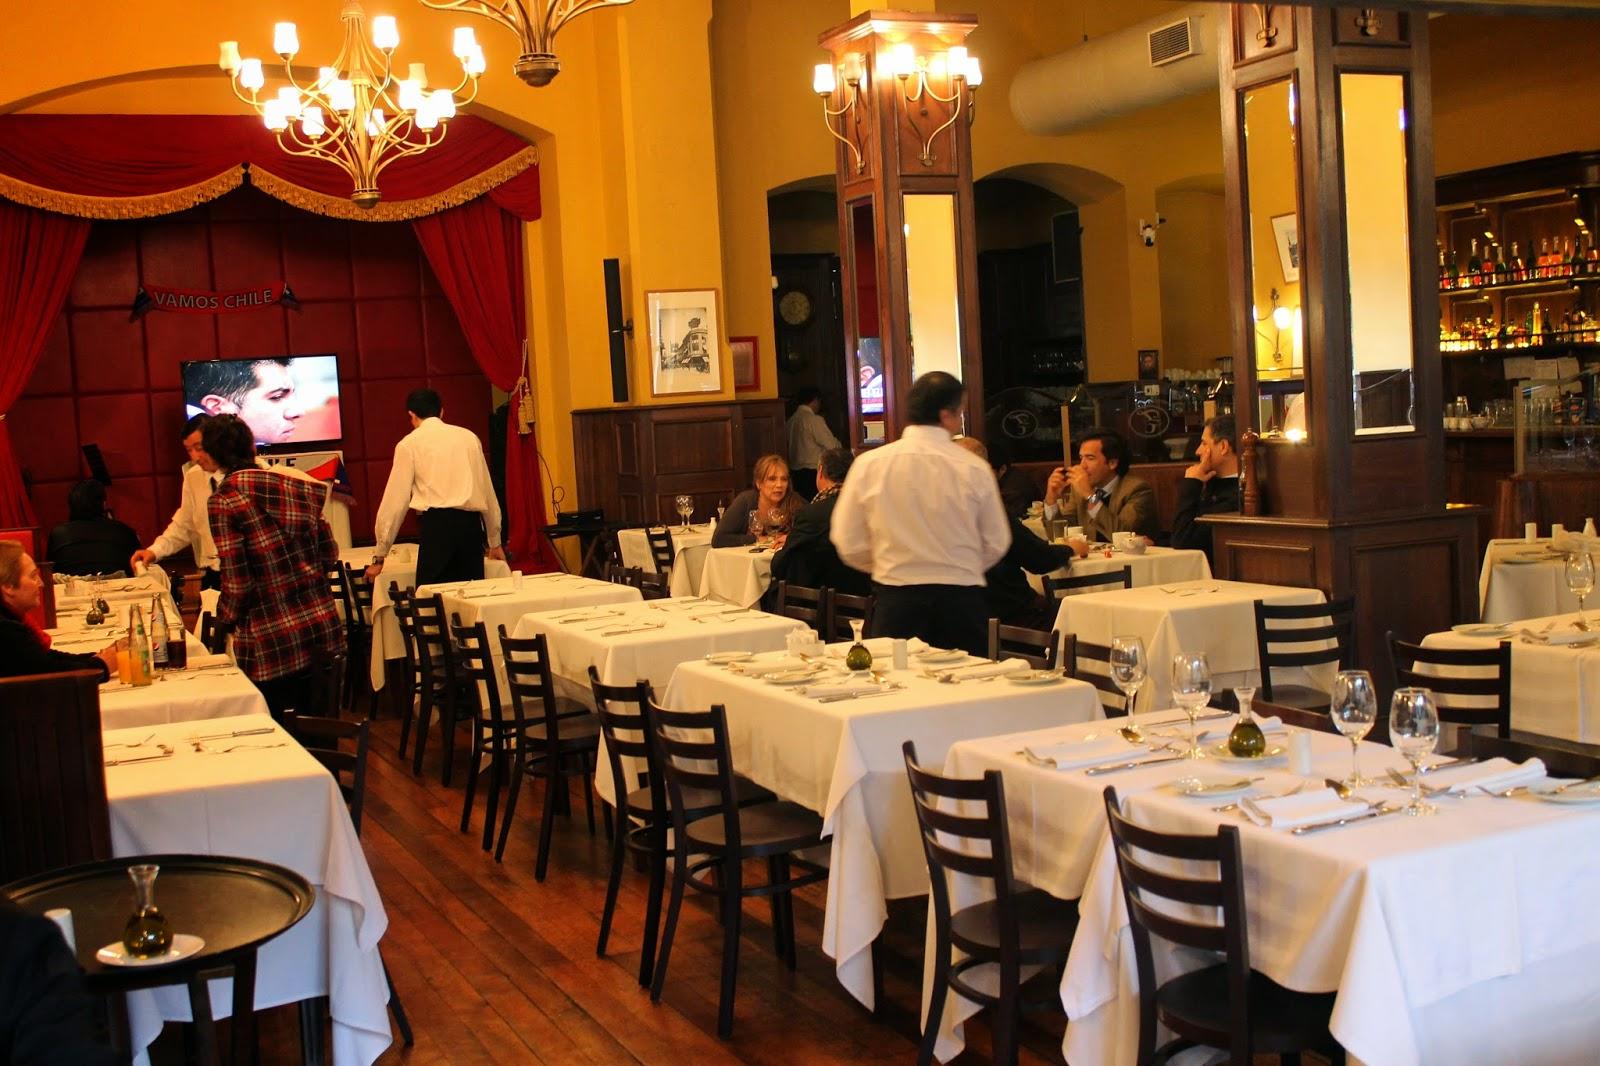 Chile restaurant